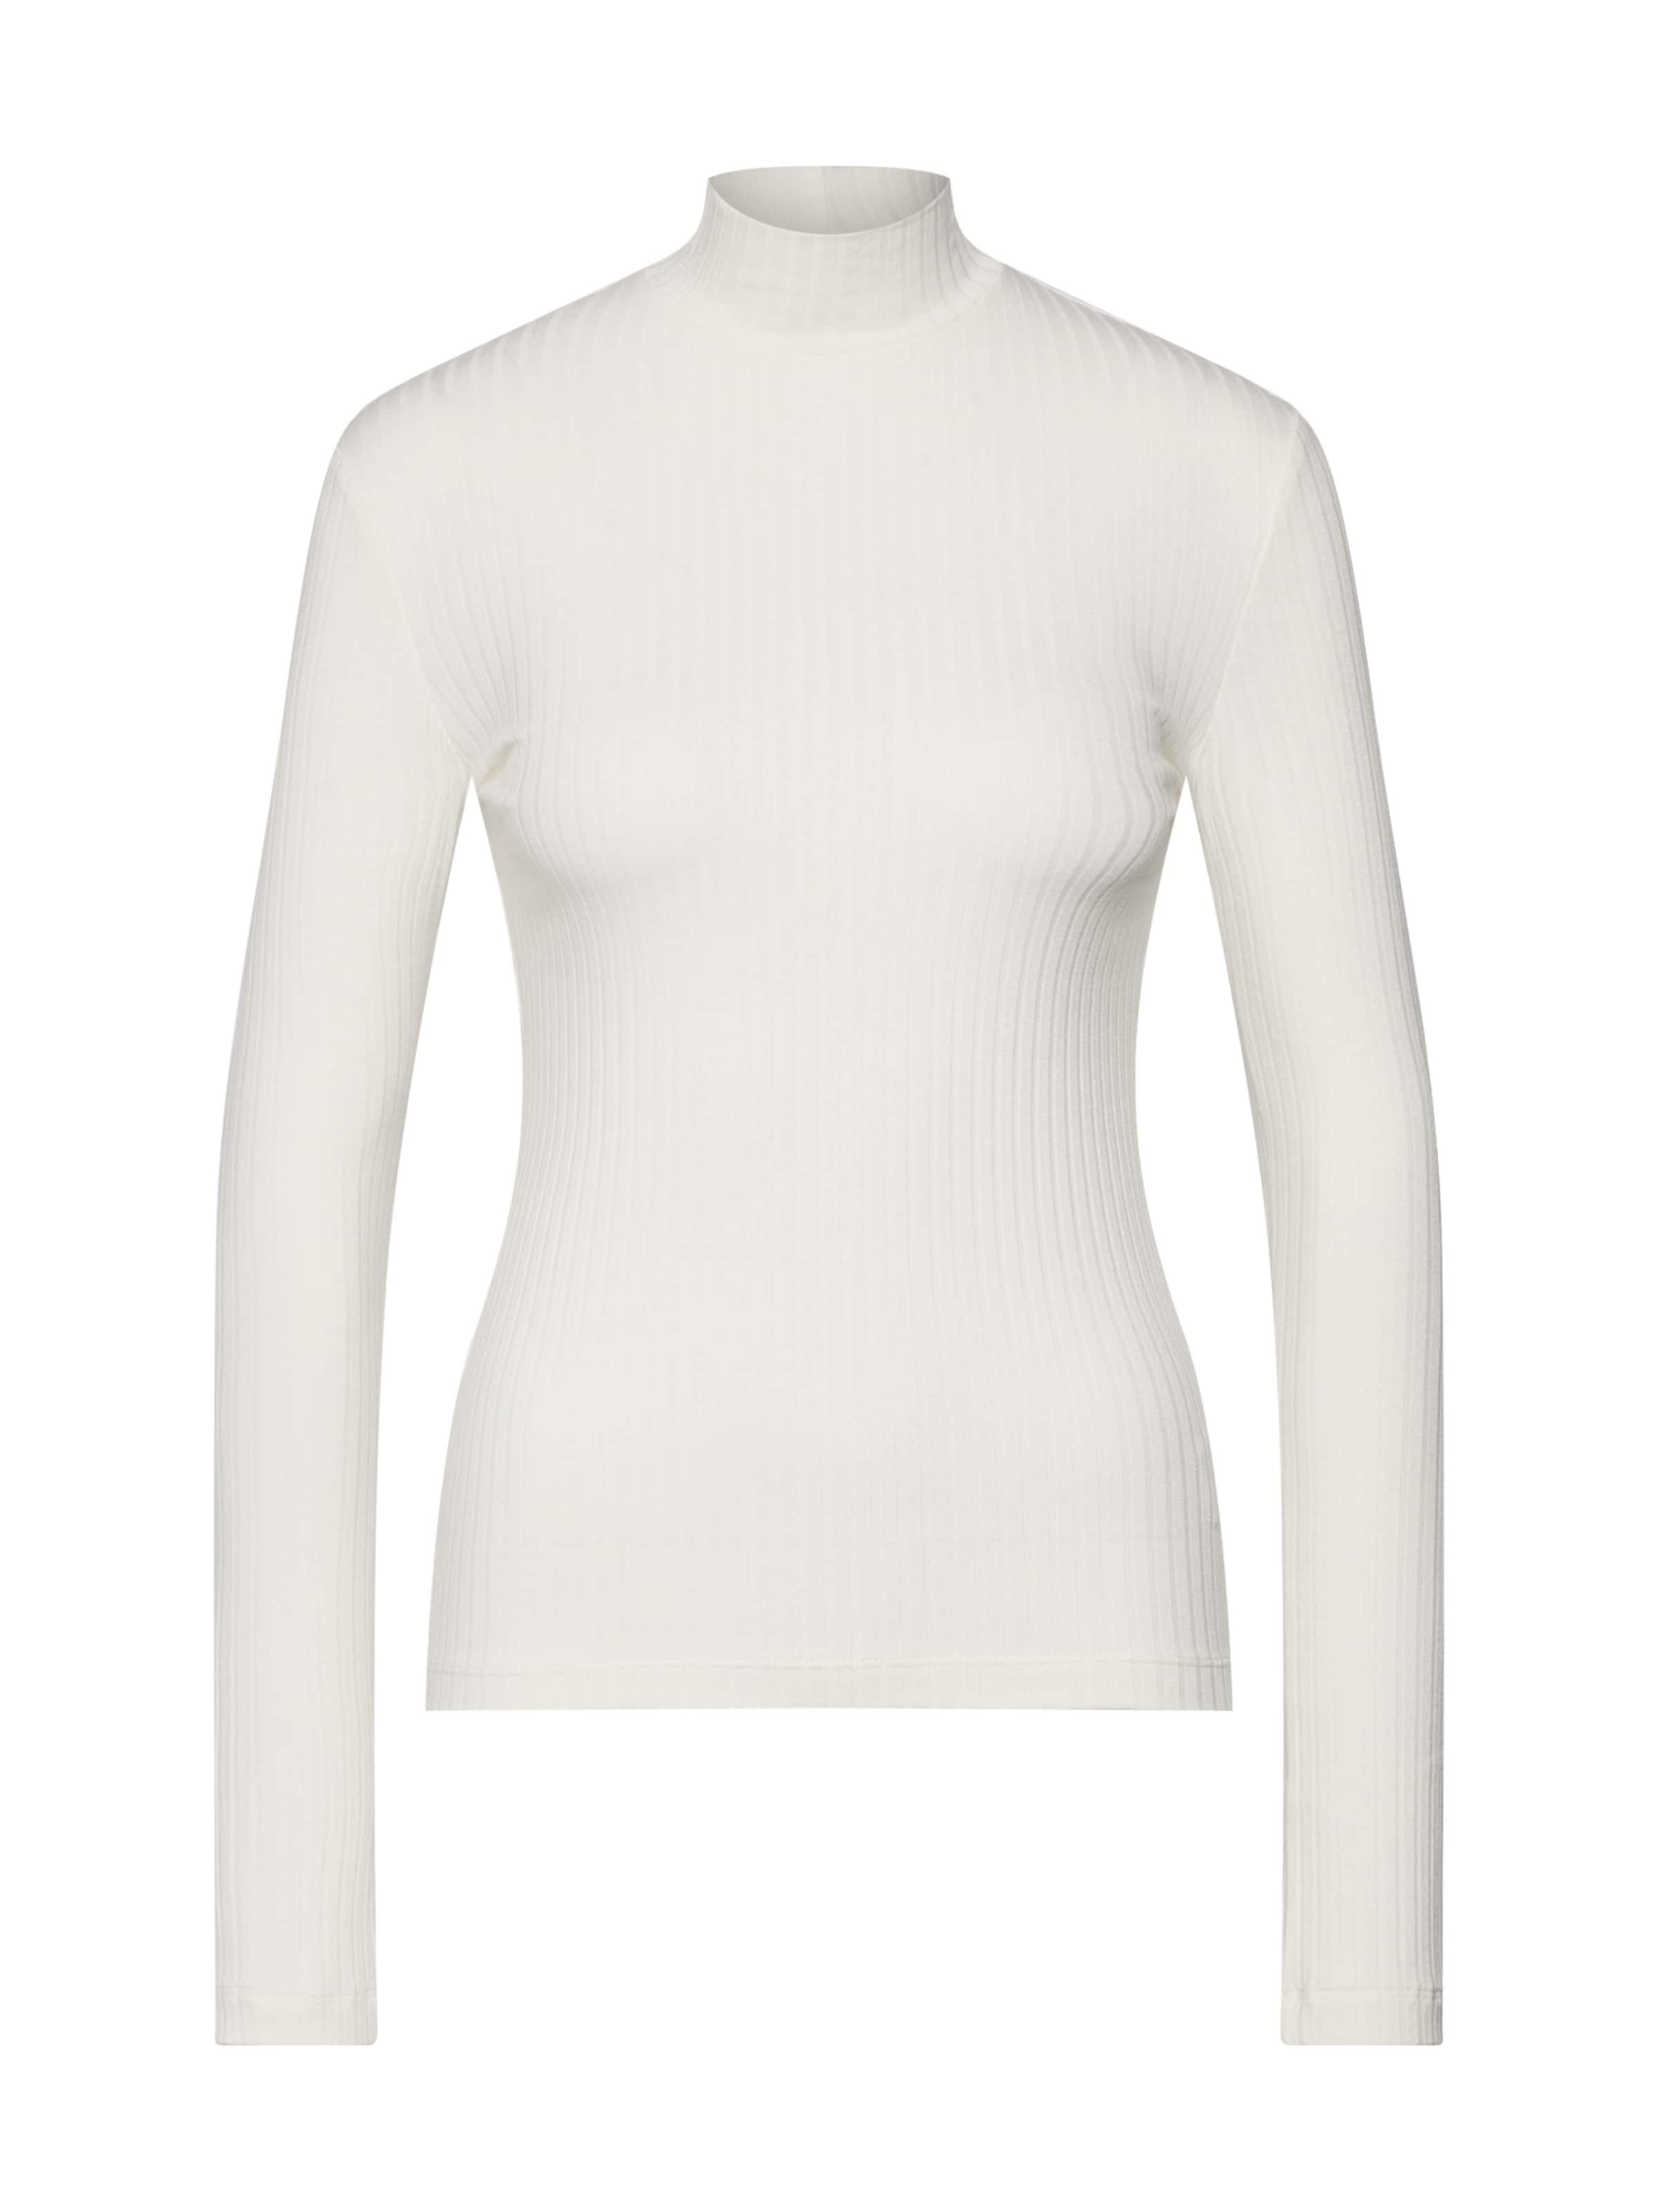 Edited Offwhite 'manon' 'manon' Shirt Edited Shirt In In In Offwhite Edited Shirt 'manon' OZPTikXu